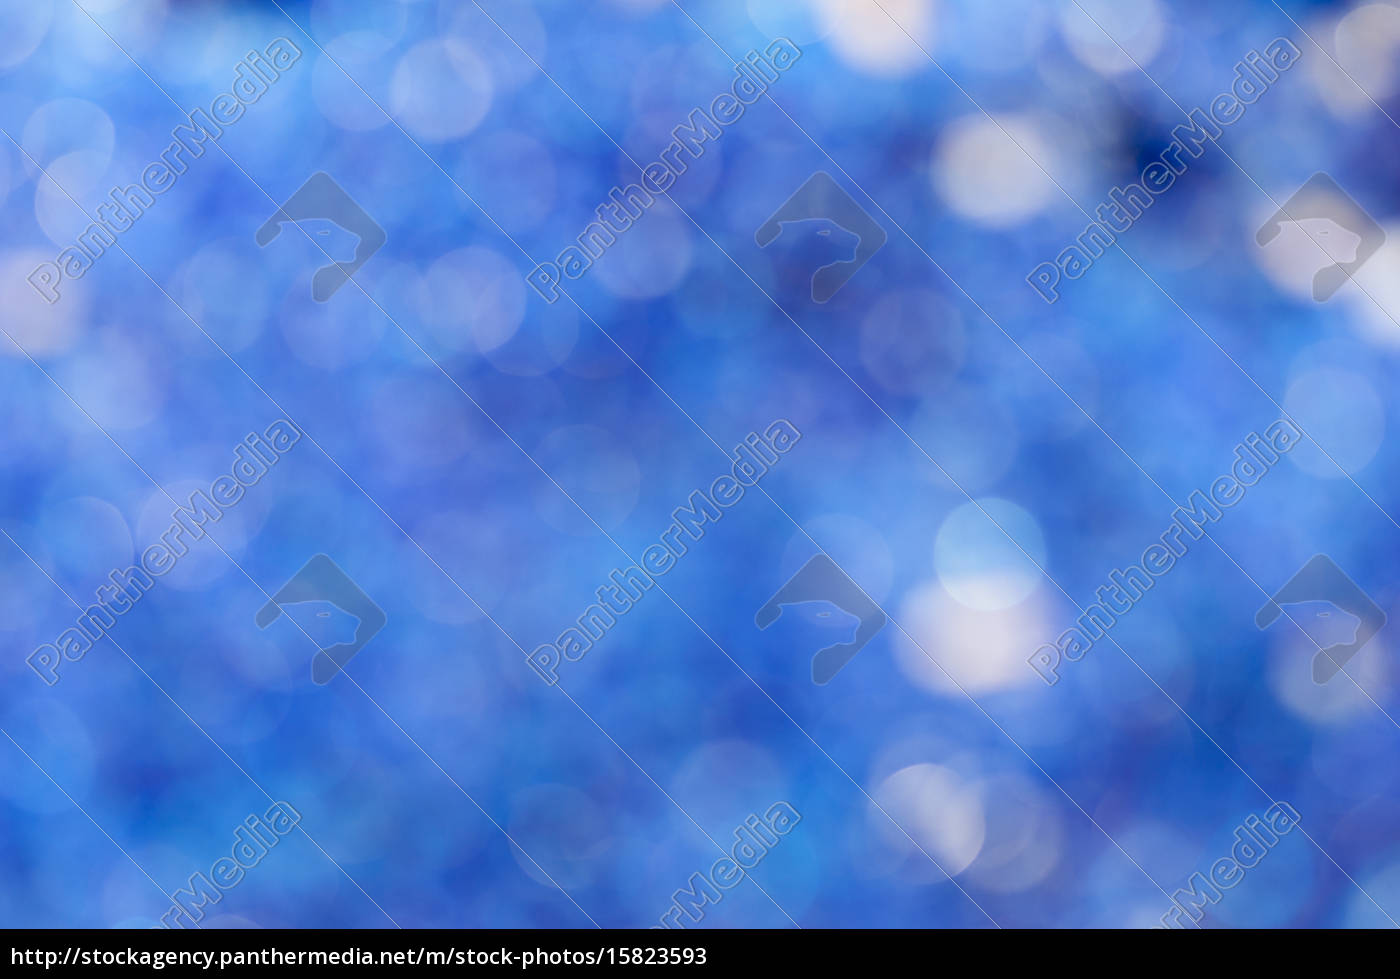 blue, blurred, background - 15823593